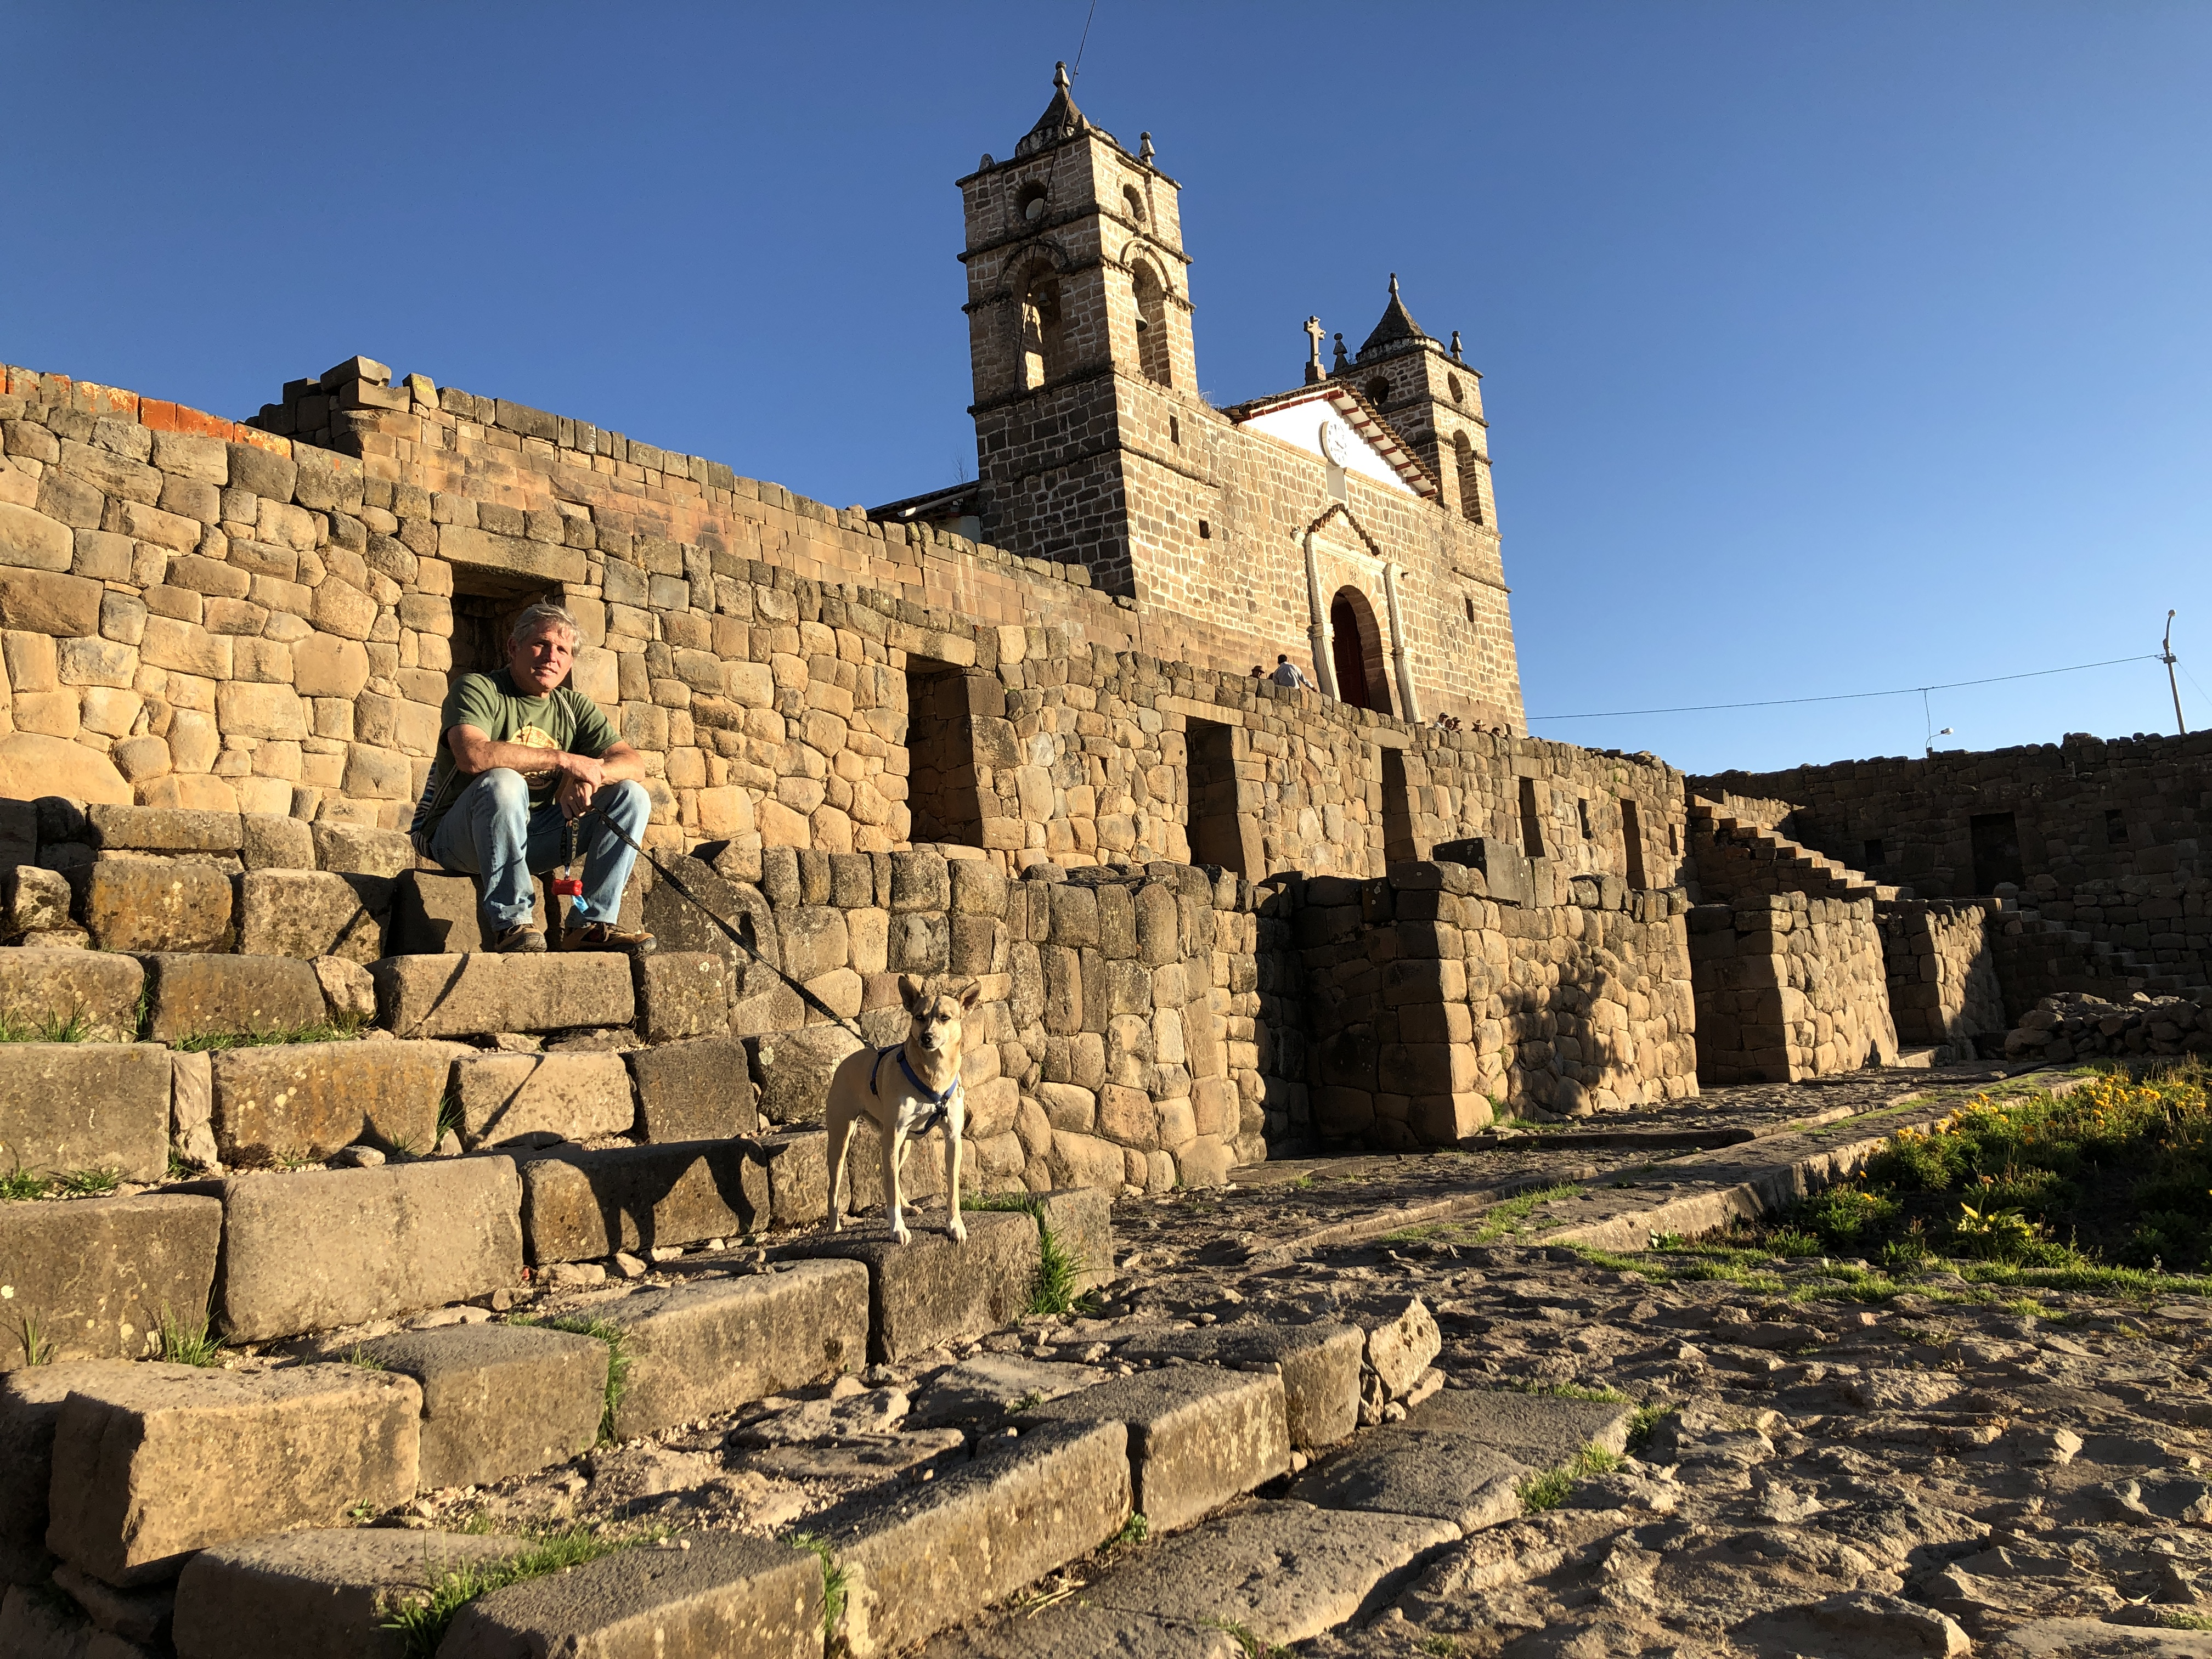 vilcashuaman church on inca temple.JPG